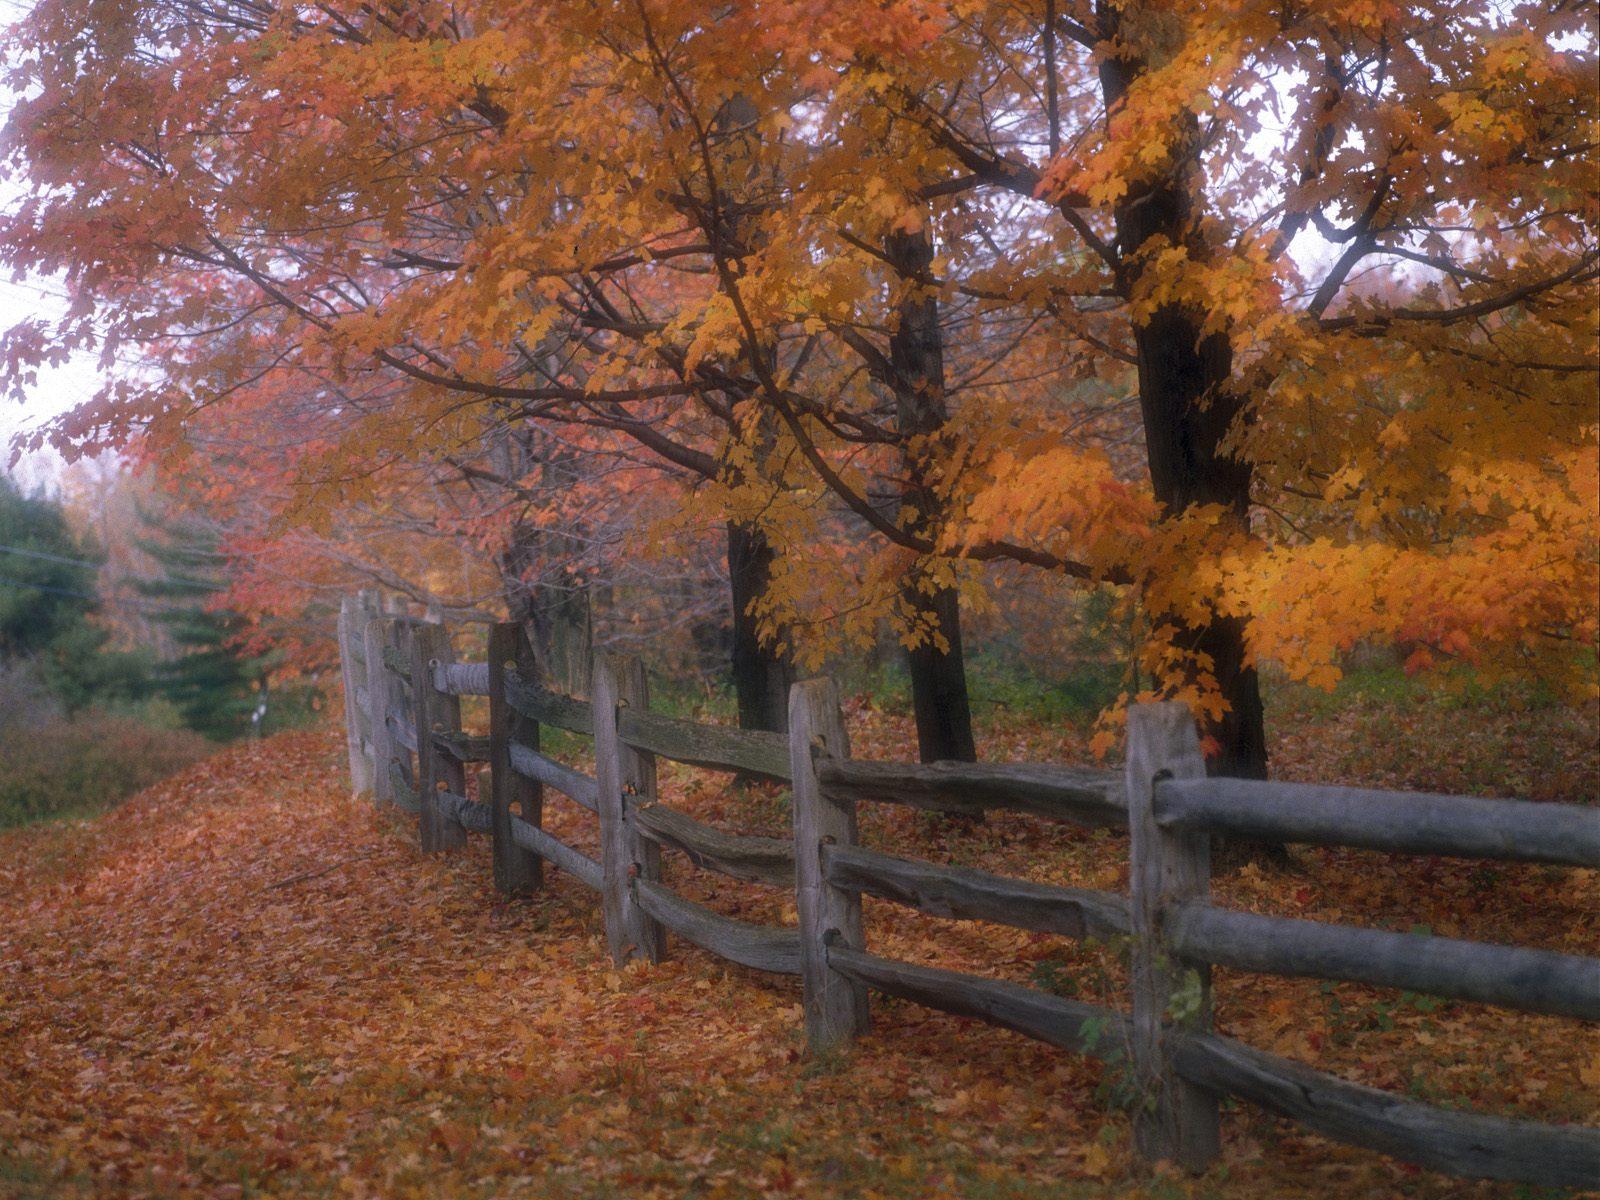 http://2.bp.blogspot.com/-KRwOK3raW_E/Td5p7yIoH2I/AAAAAAAAAMk/CJ0AMGxYiRo/s1600/autumn+6.jpg